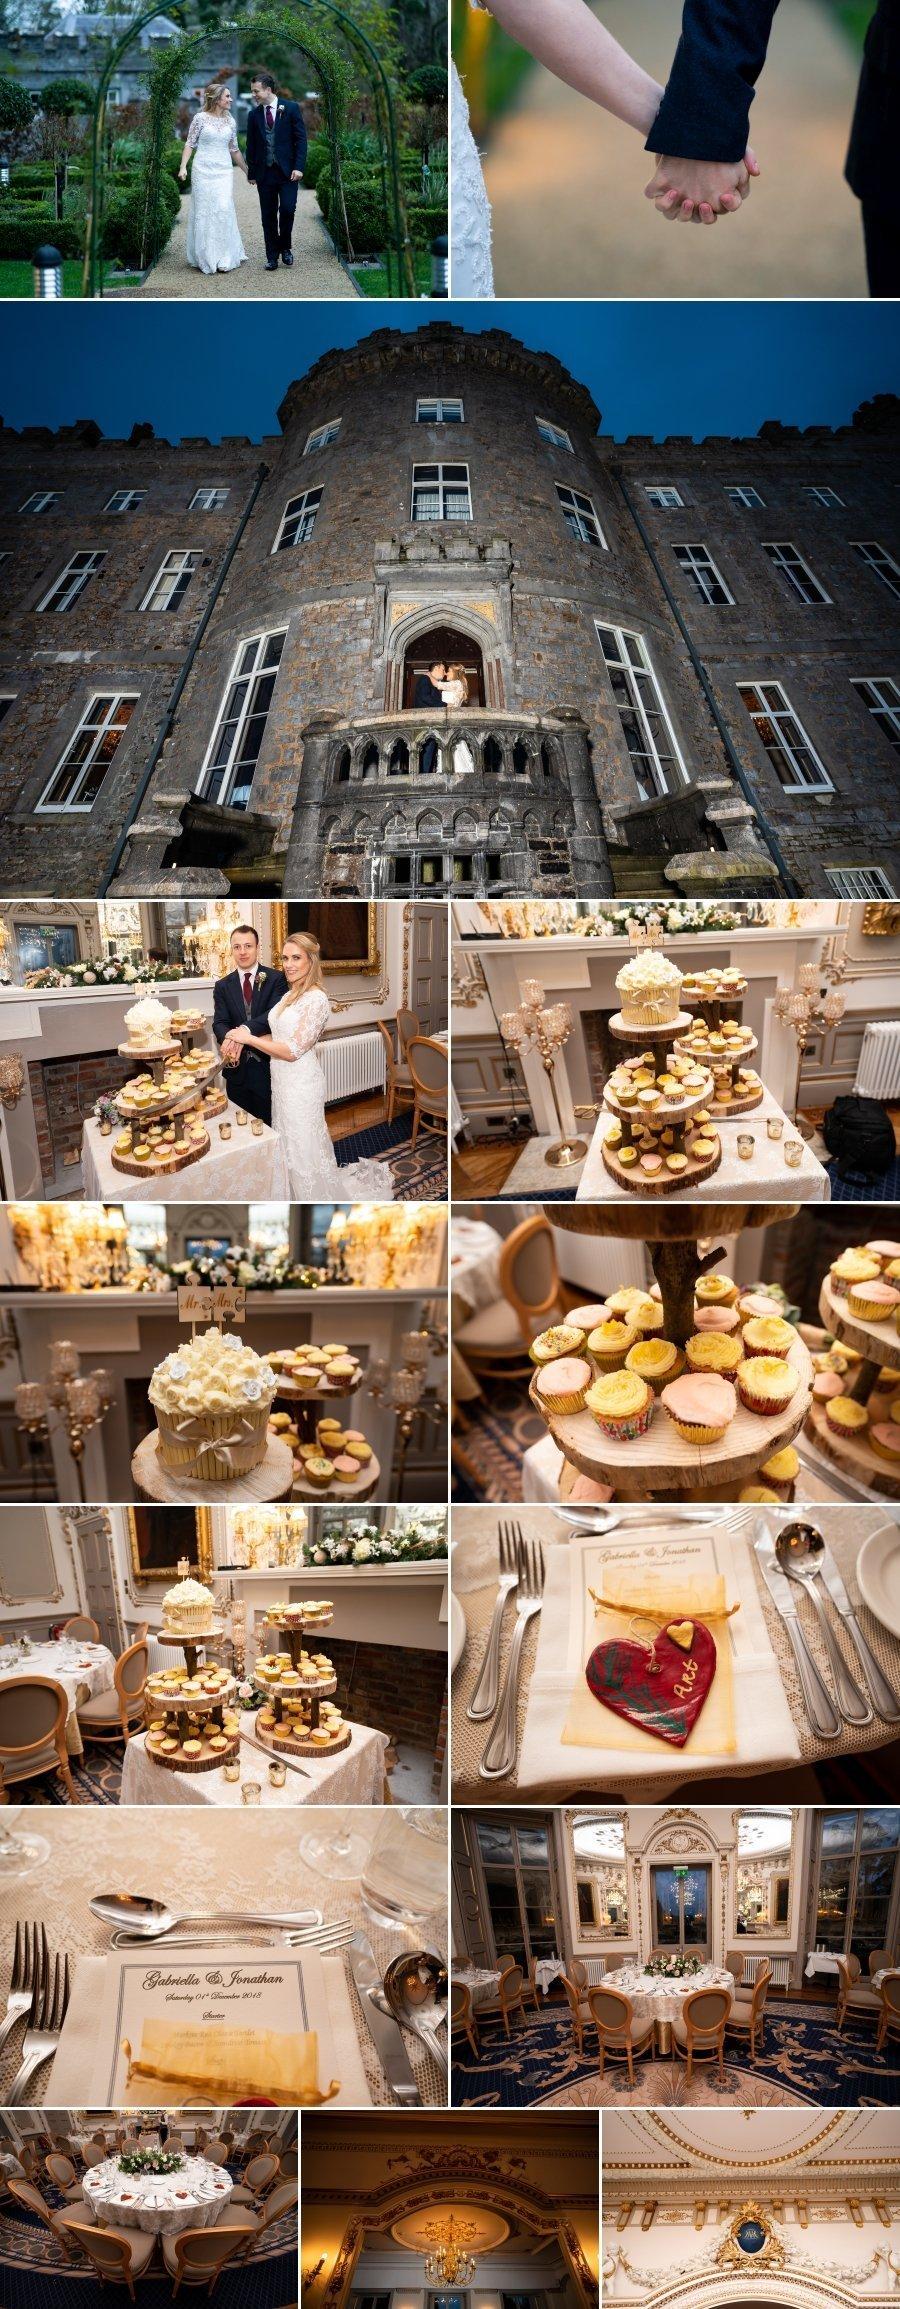 Markree Castle Sligo Wedding bride and groom cut the cake